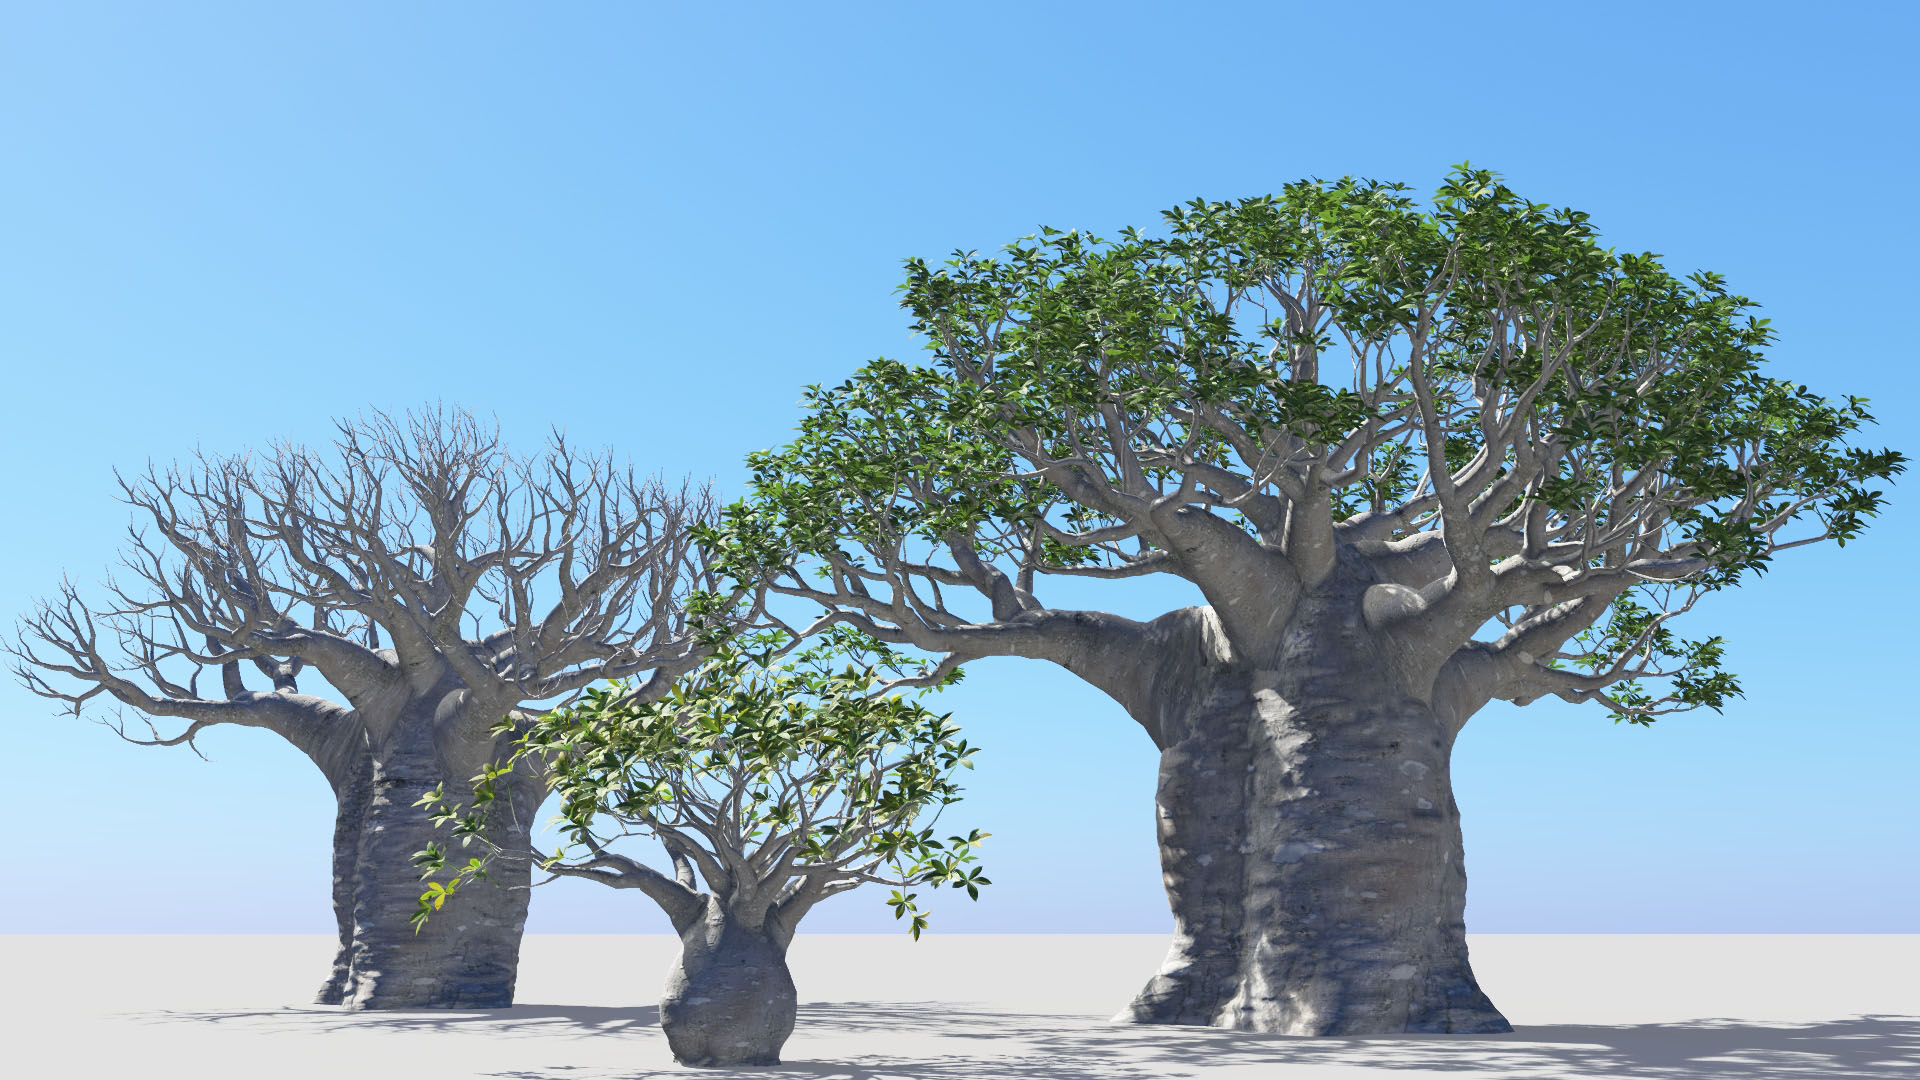 3D model of the African continental baobab Adansonia digitata